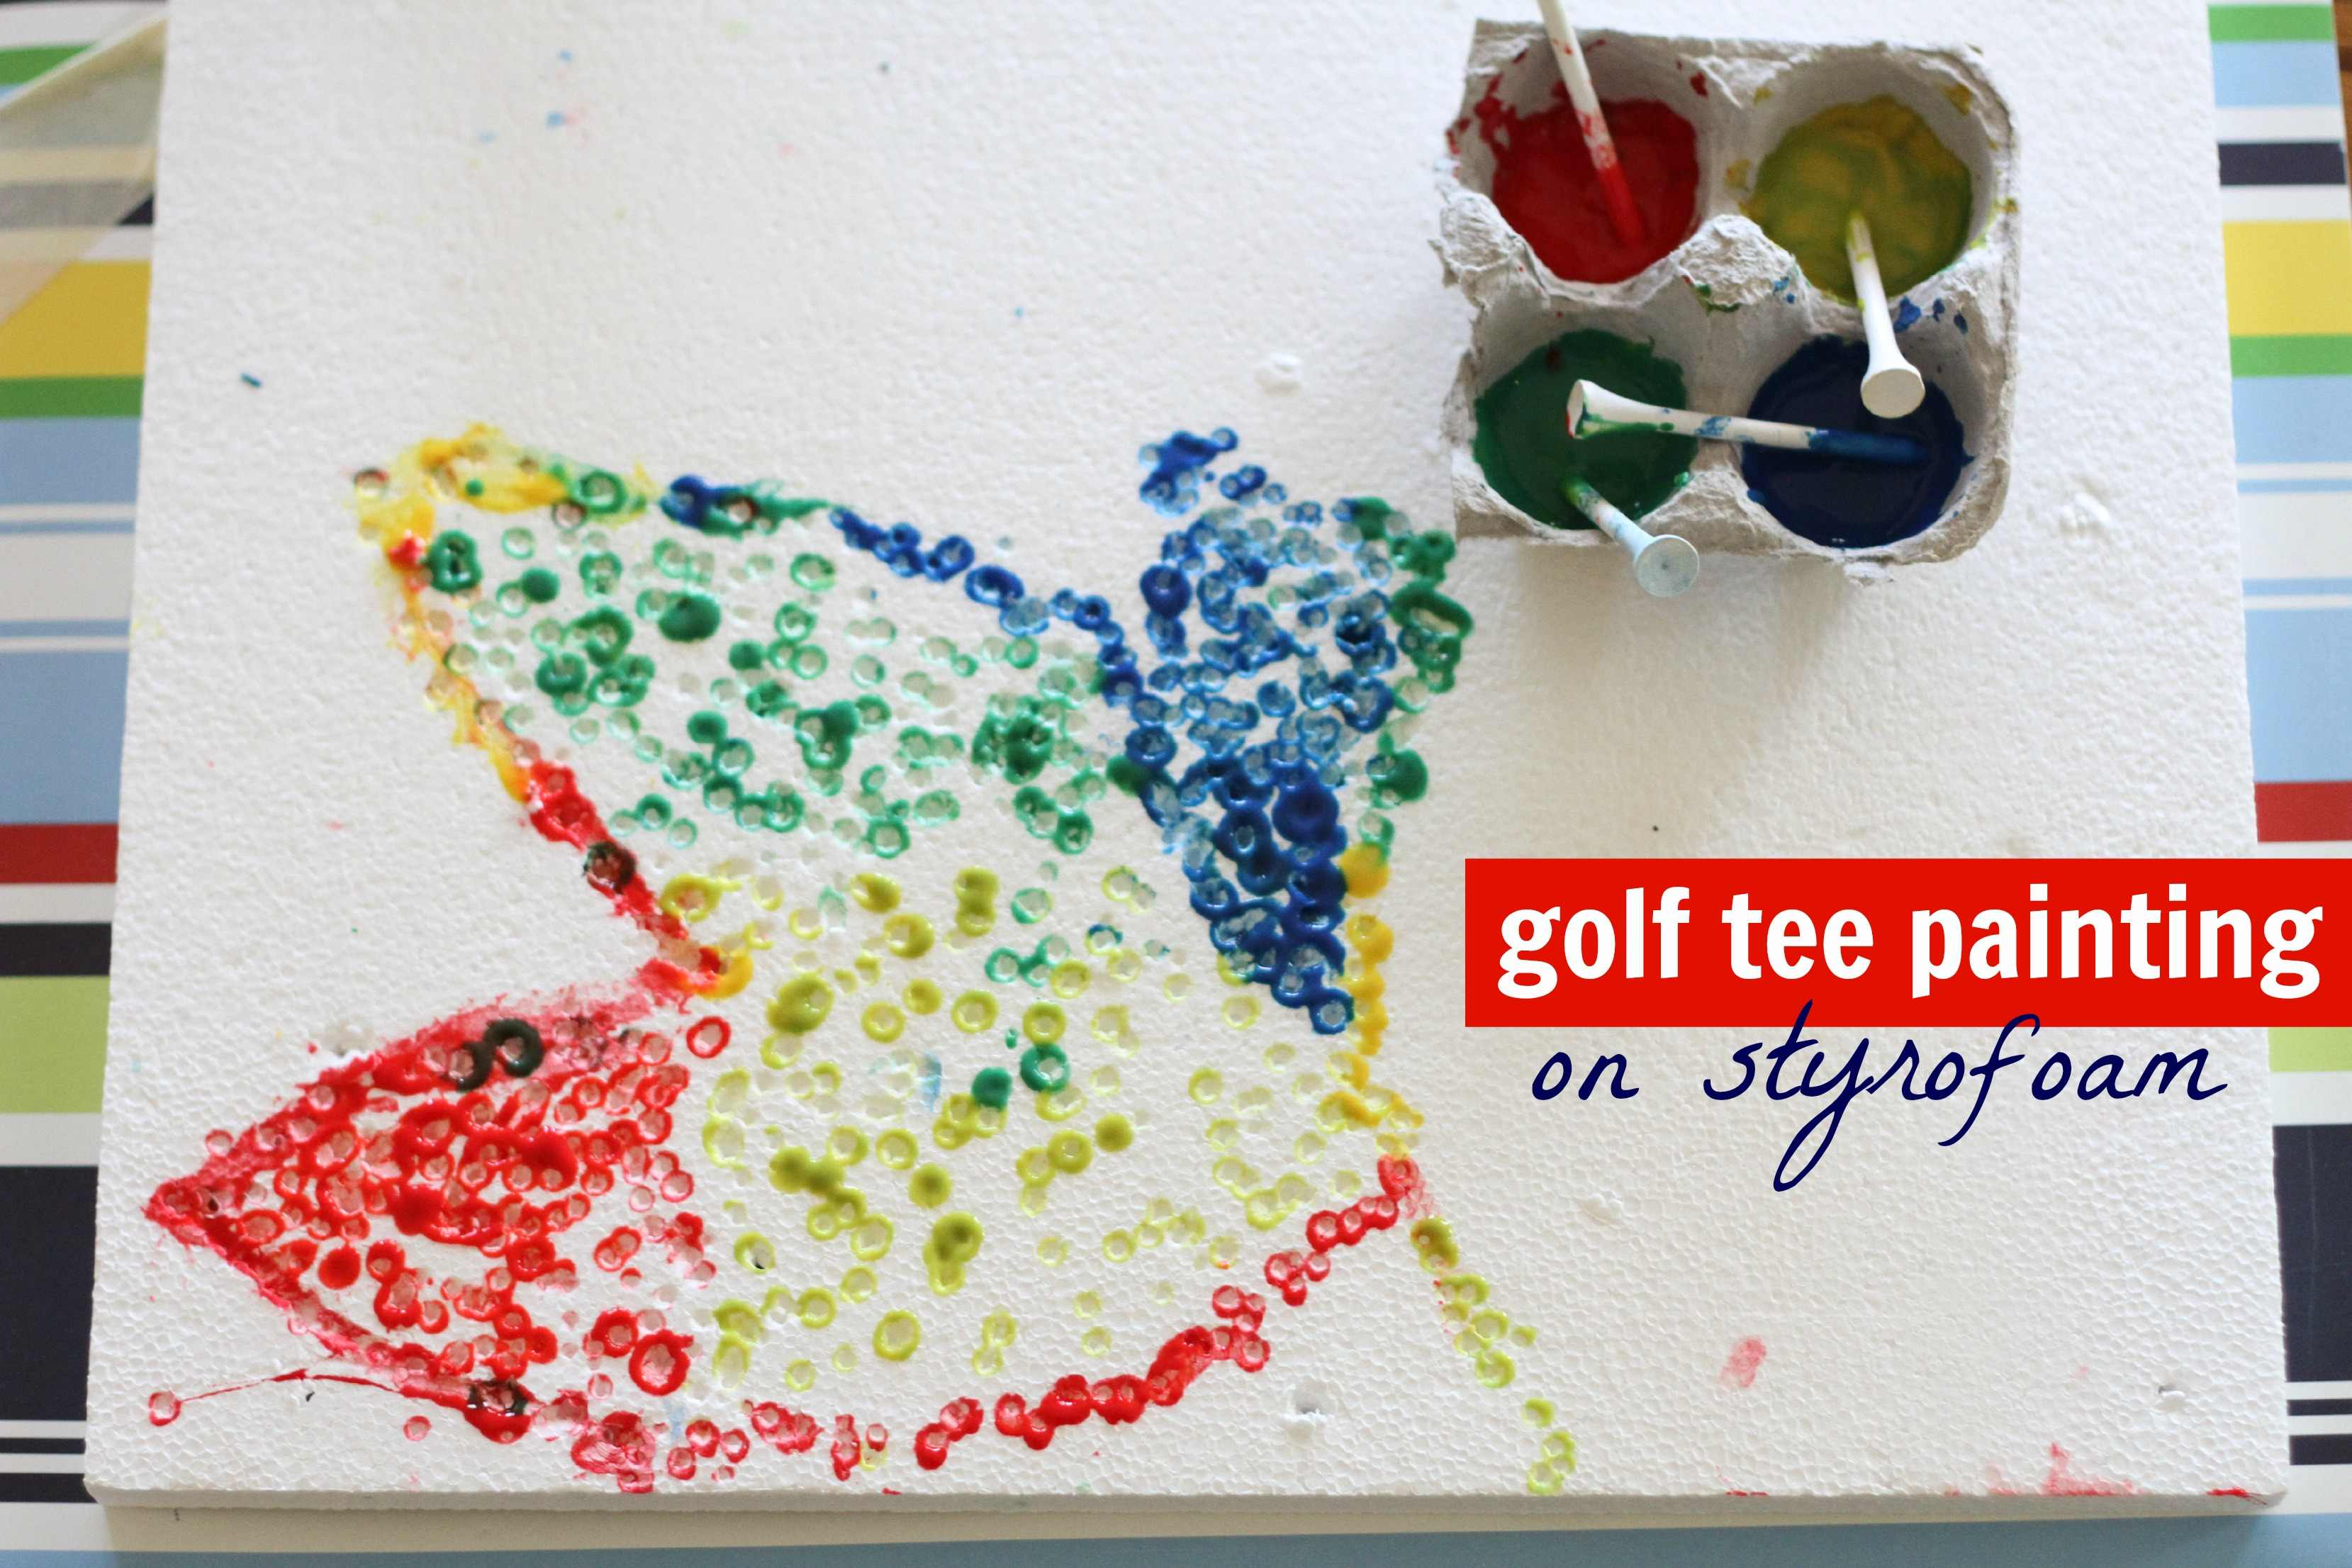 Golf Tee Painting on Styrofoam I Can Teach My Child!